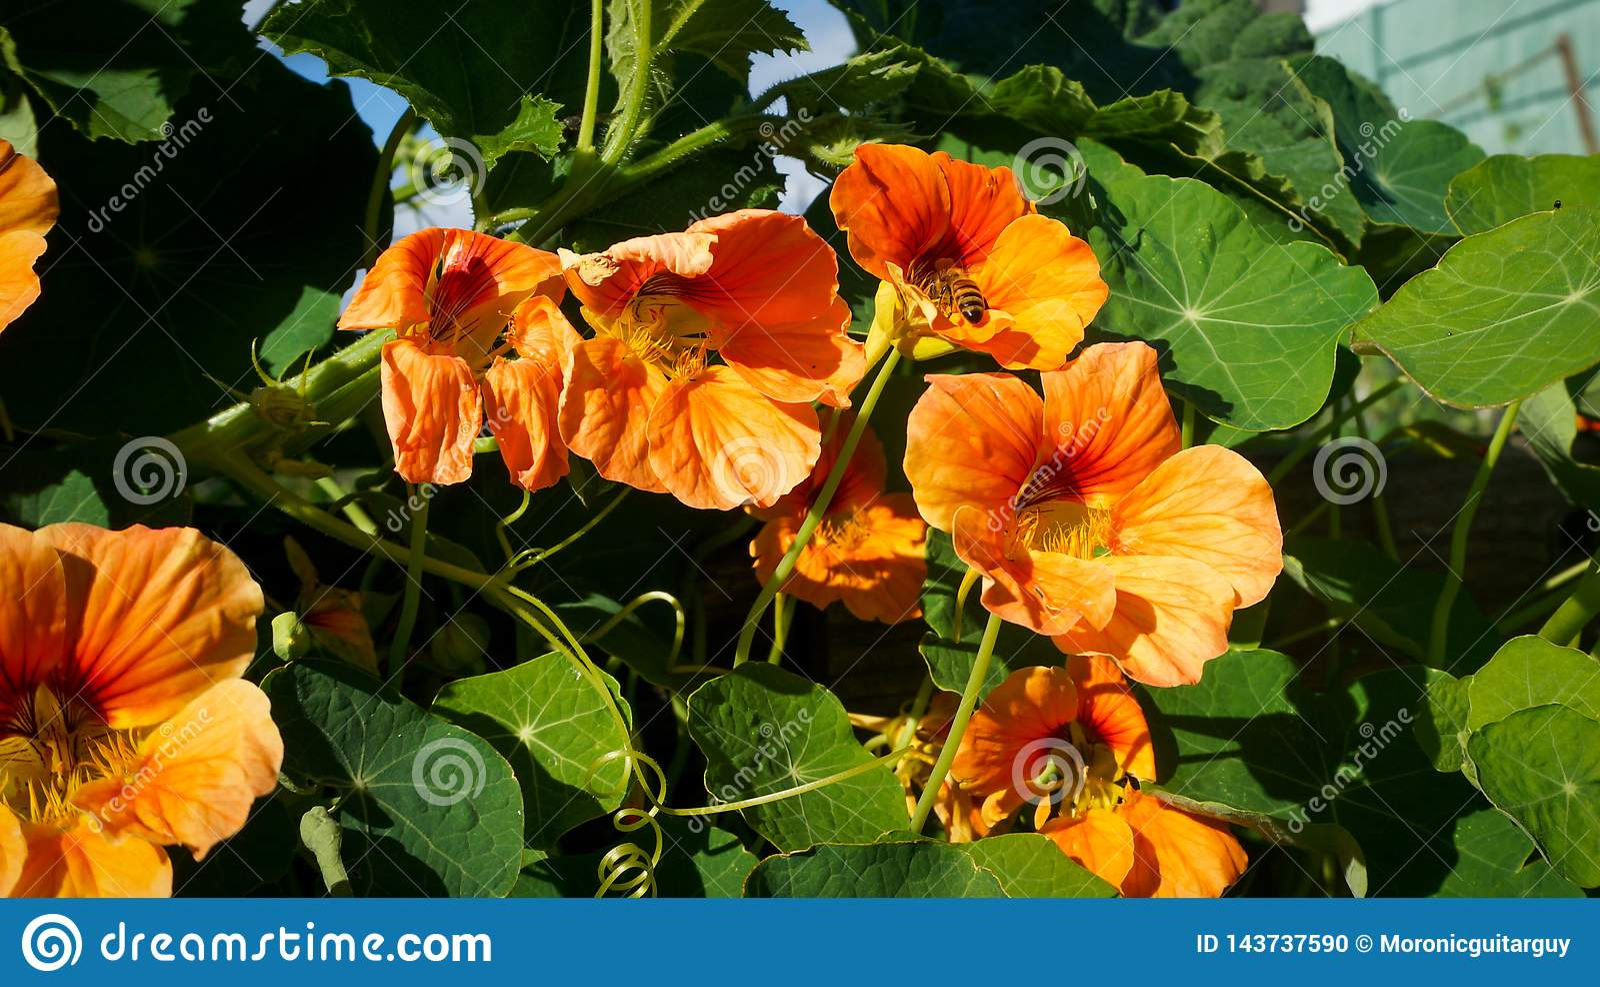 Bee gathers pollen from orange flowers